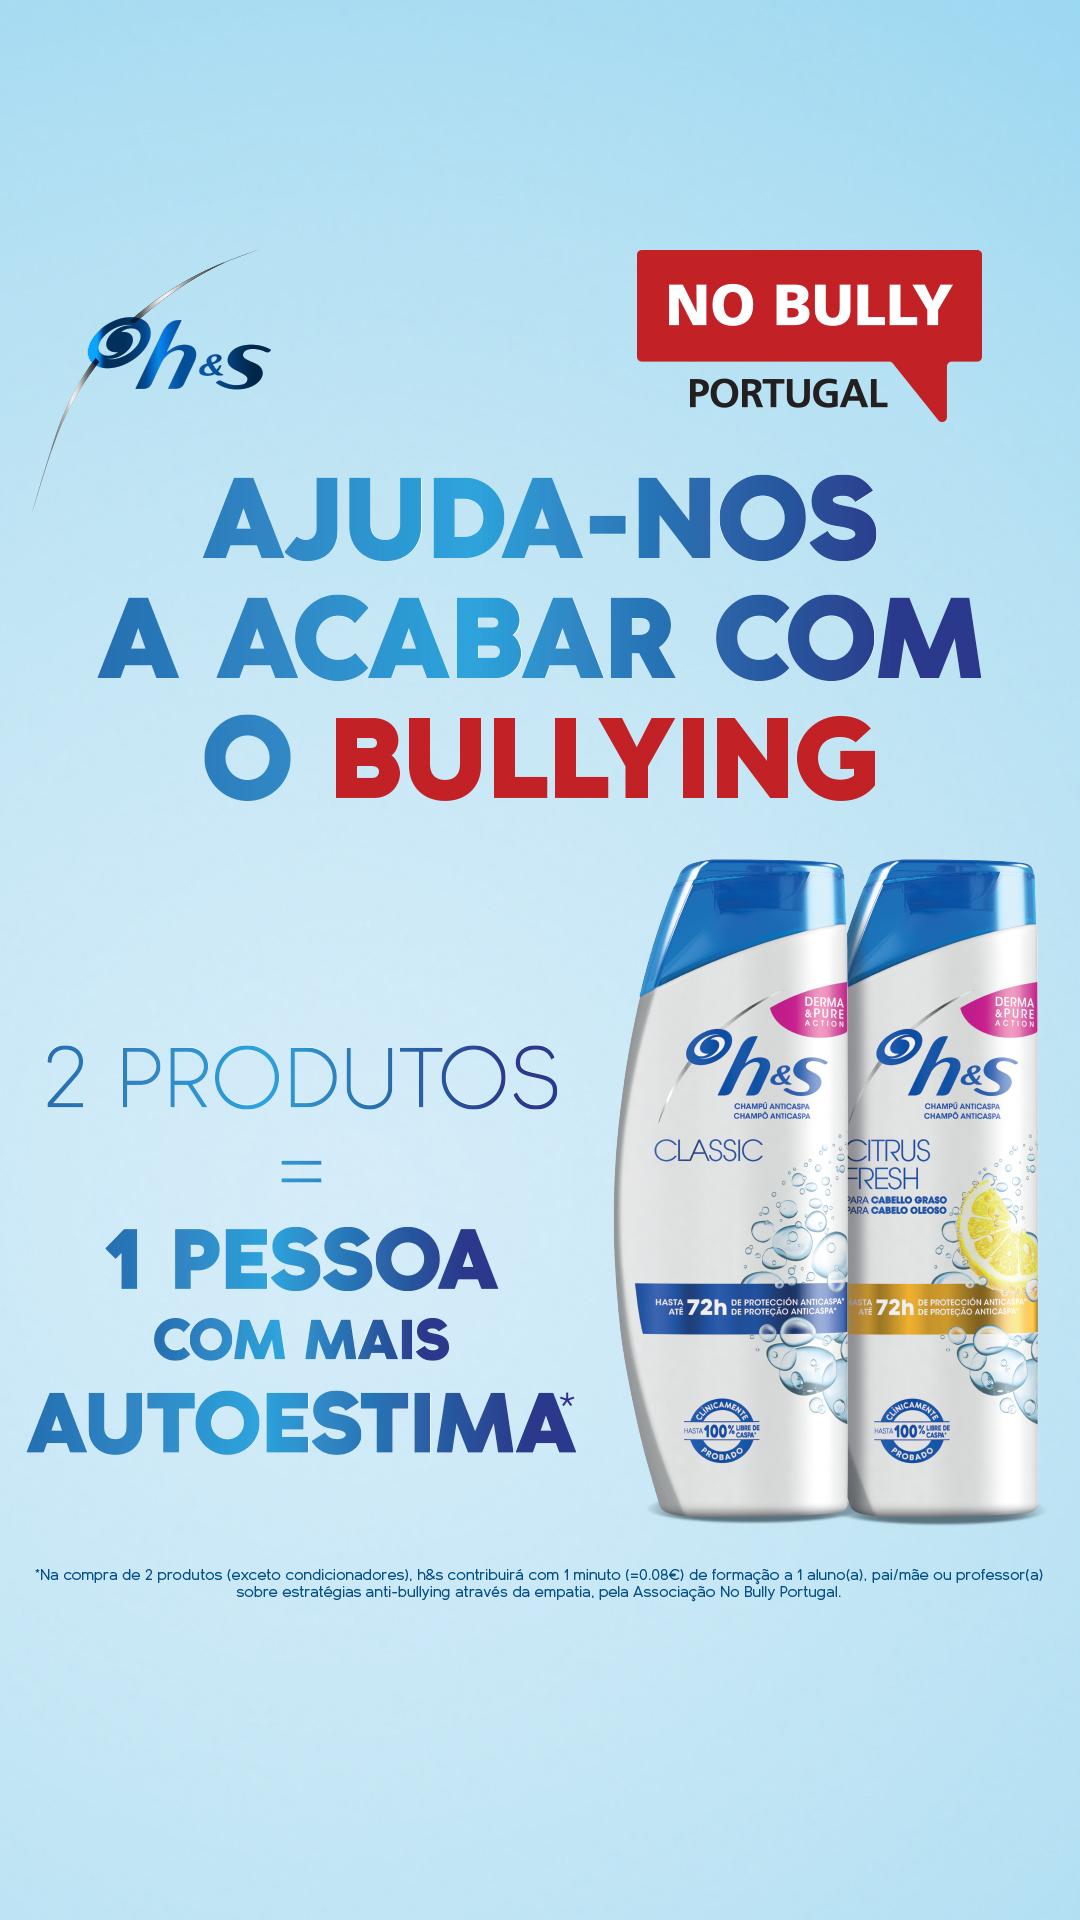 H&s bullying story